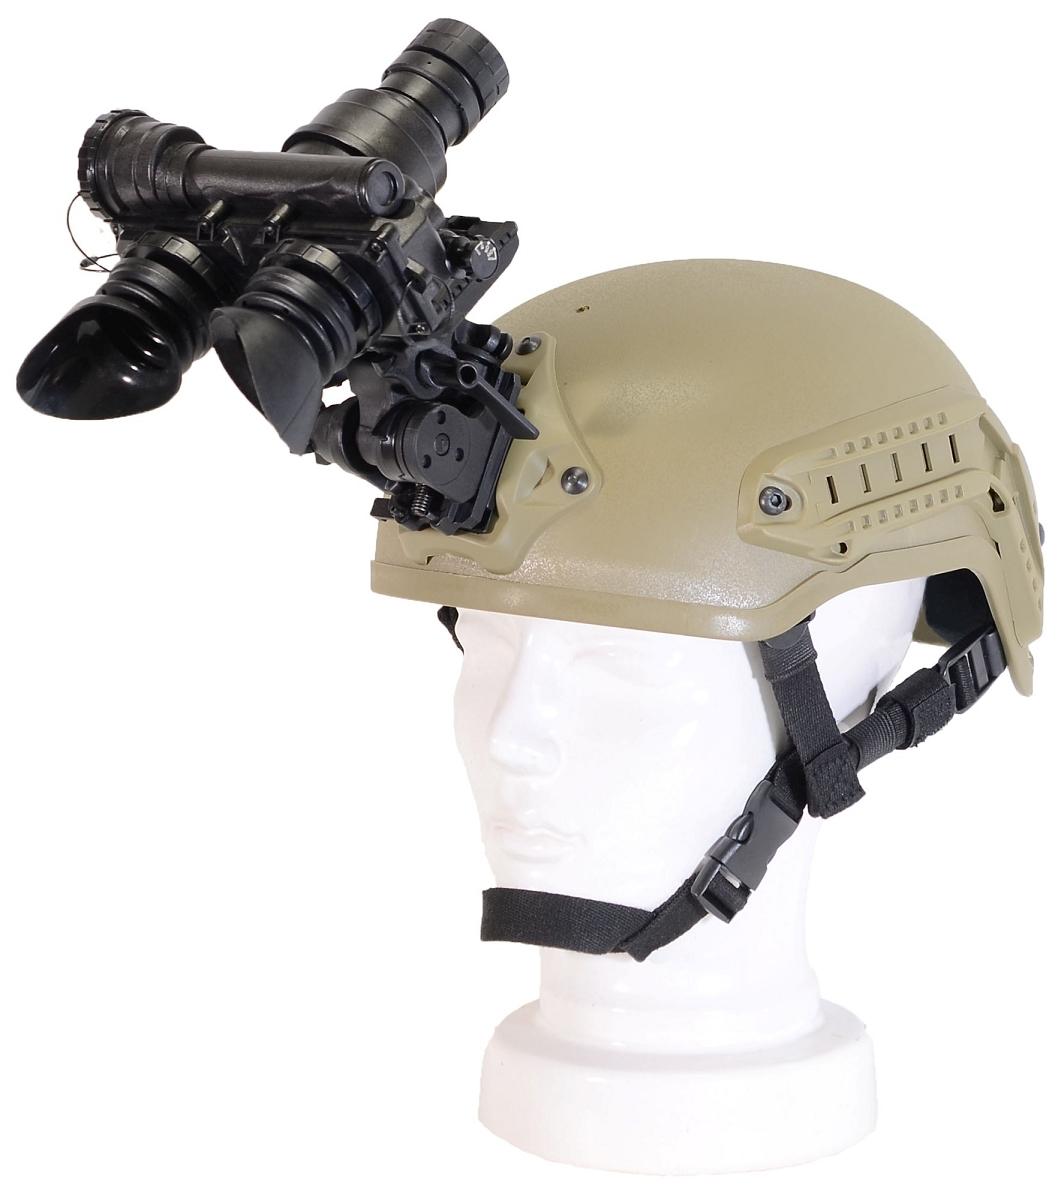 Gsci Pvs 7 Night Vision Goggles Binoculars